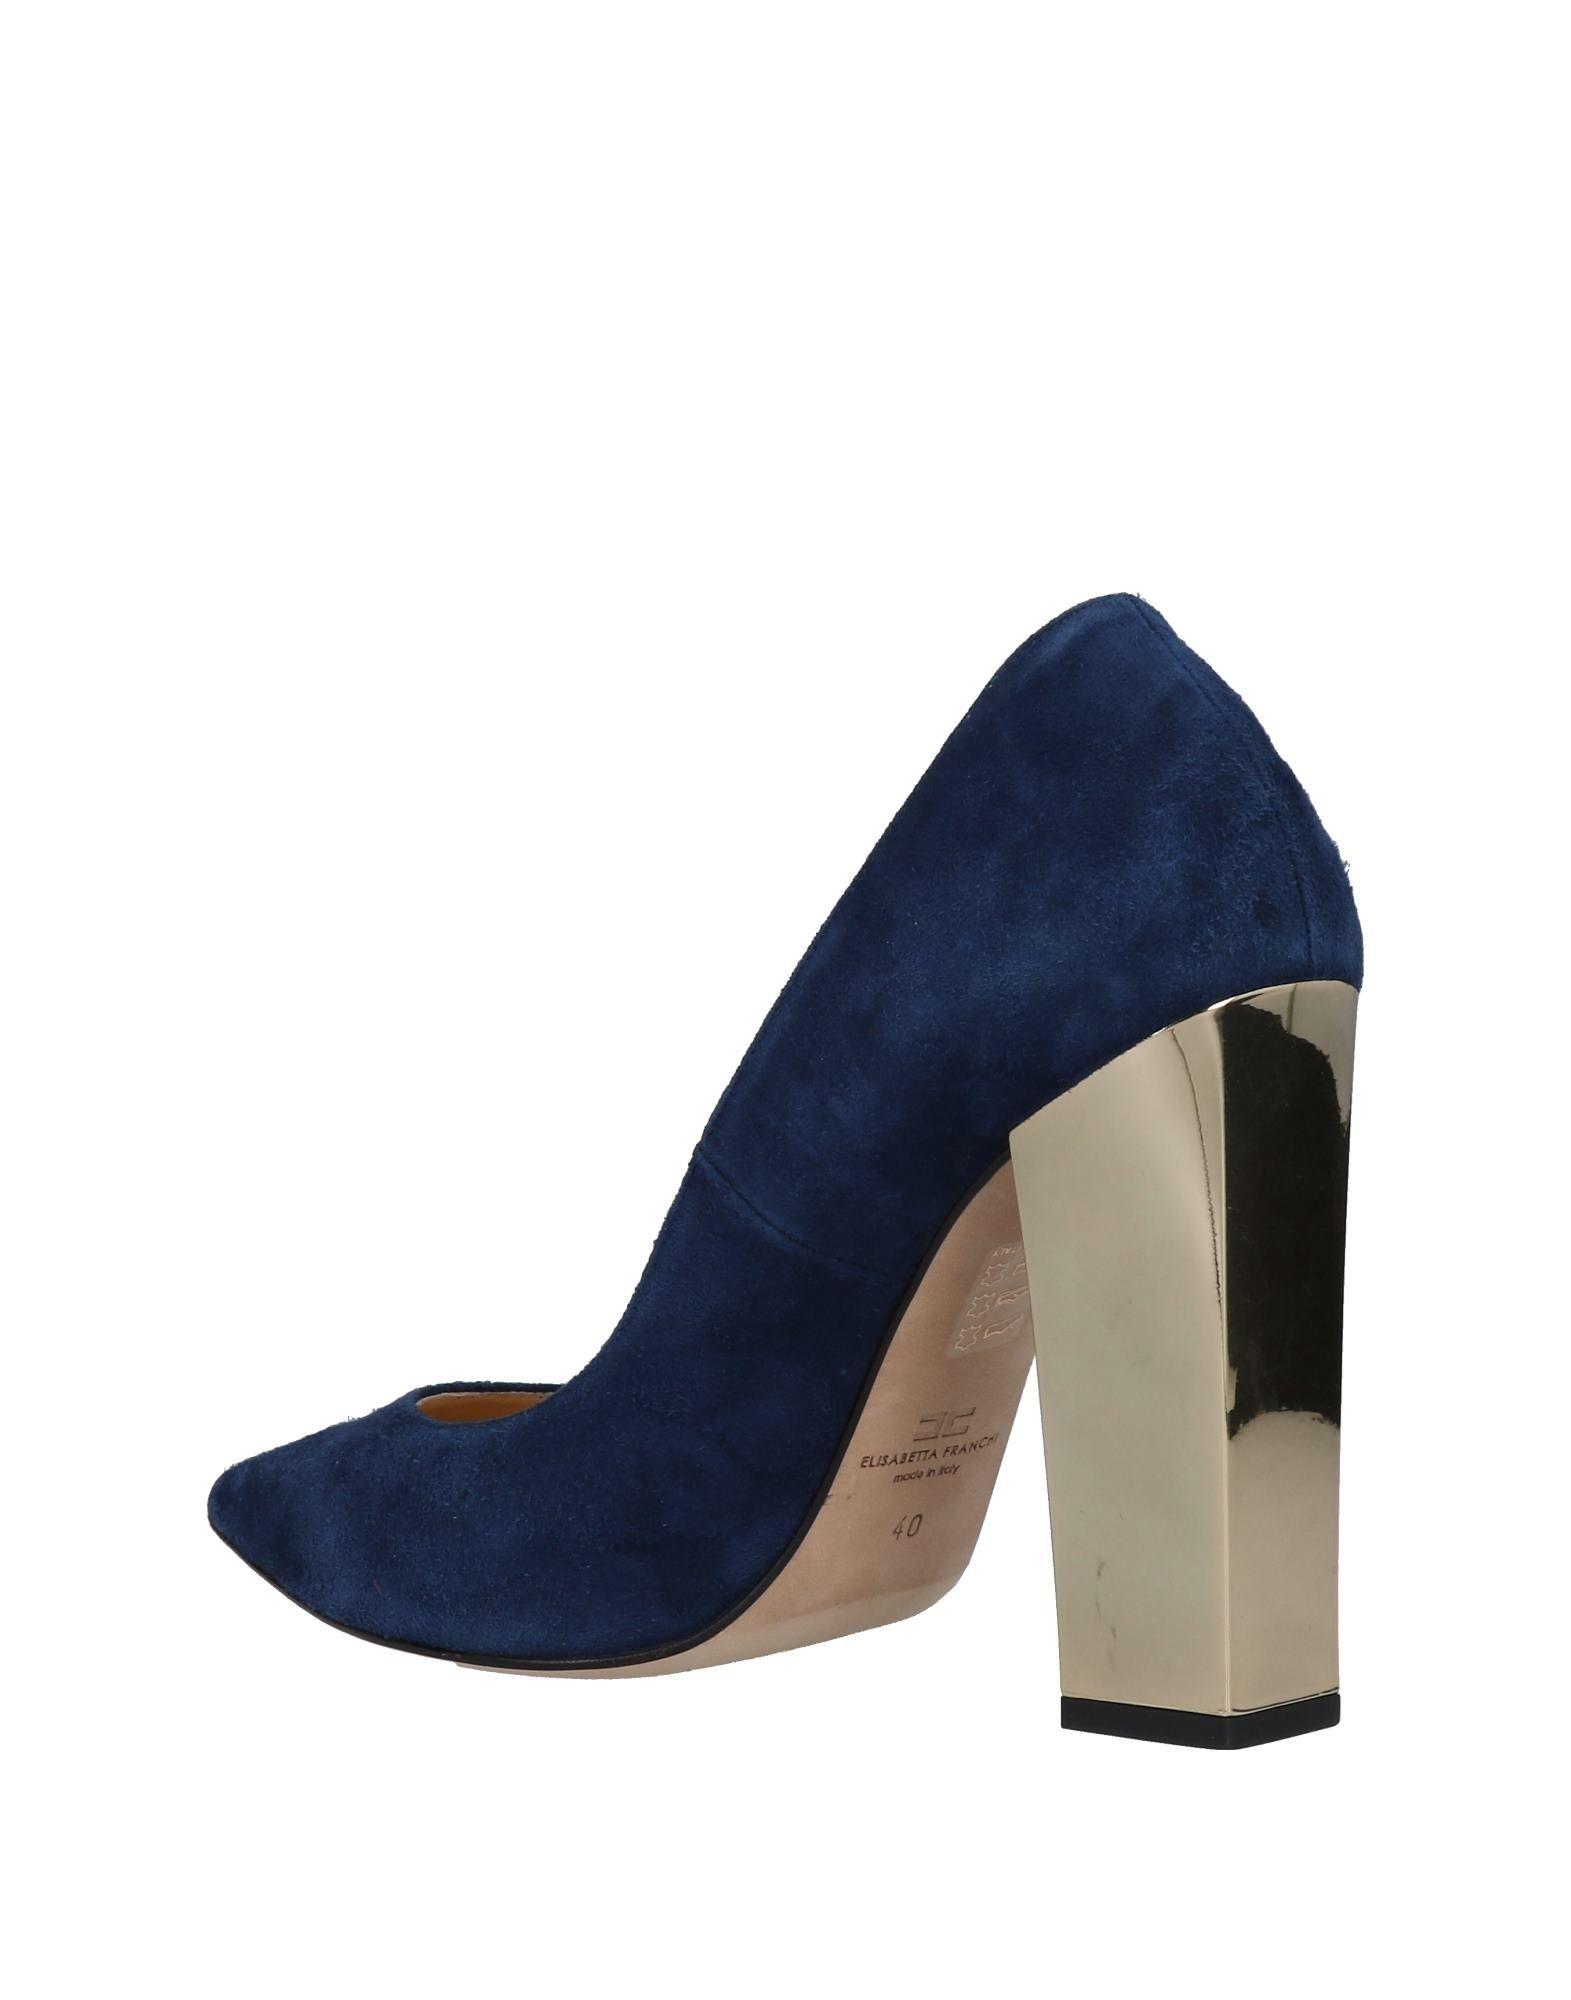 Stilvolle billige Damen Schuhe Elisabetta Franchi Pumps Damen billige 11277297MX aac016